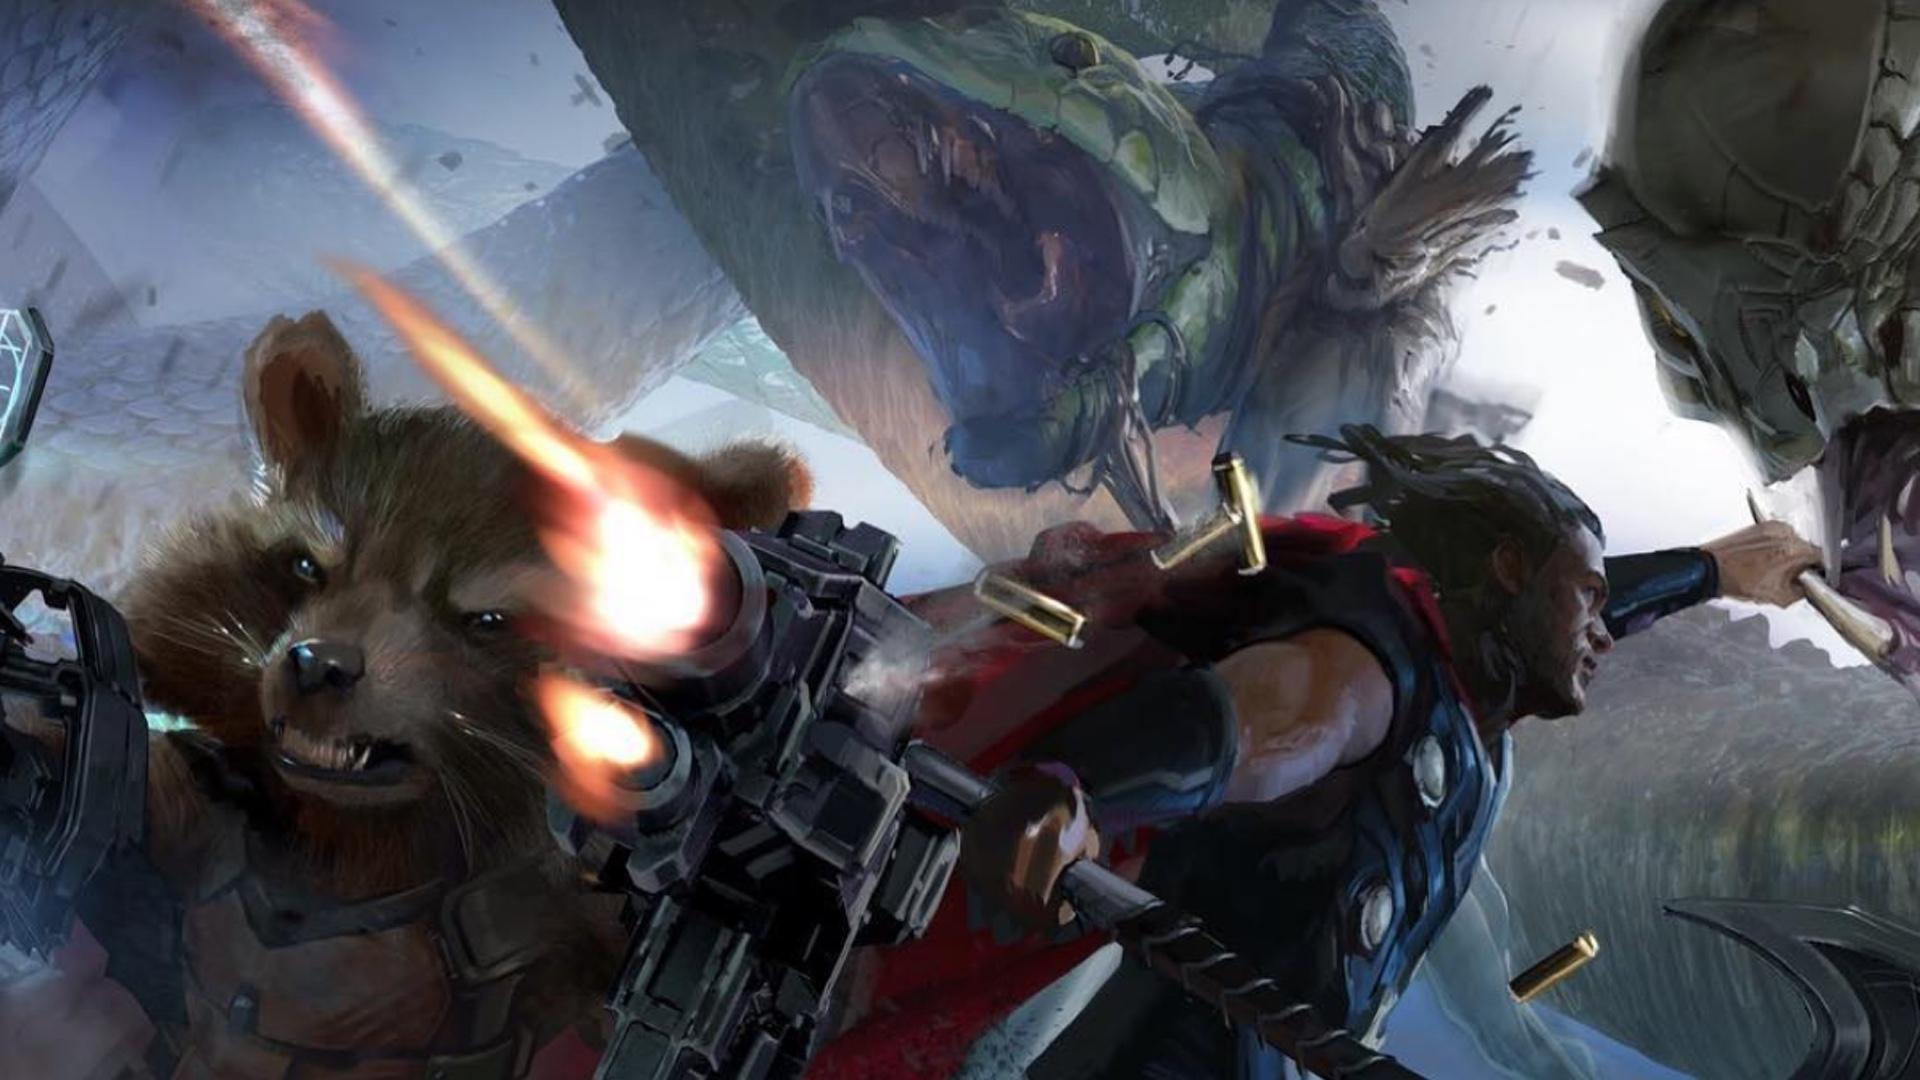 avengers-infinity-war-key-art-shows-thor-and-rocket-battling-giant-serpents-social.jpg